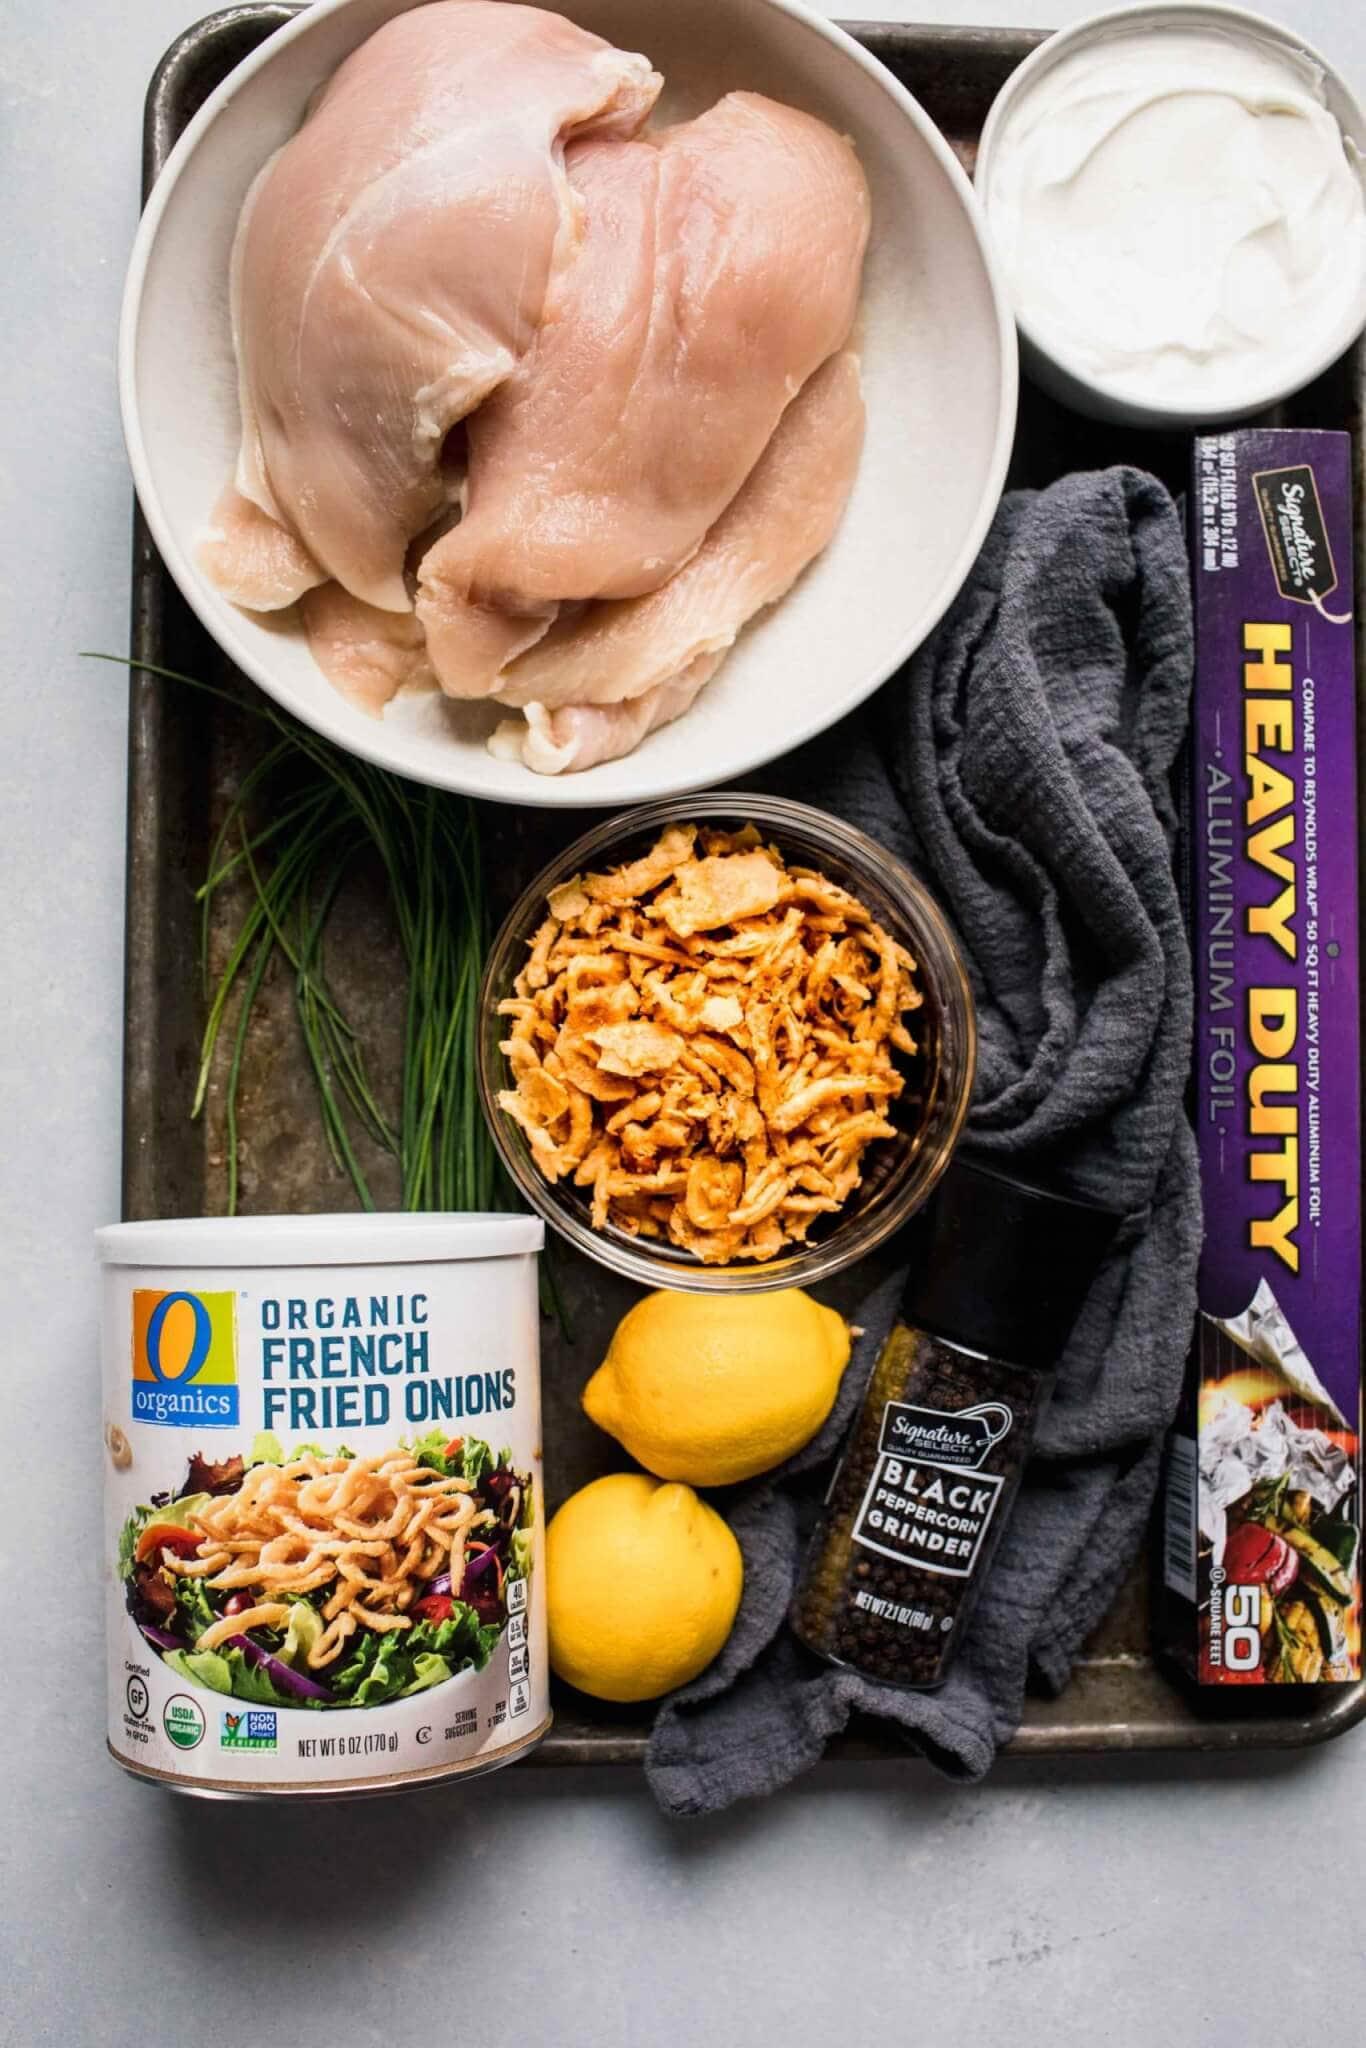 Ingredients for crispy baked chicken on baking sheet.